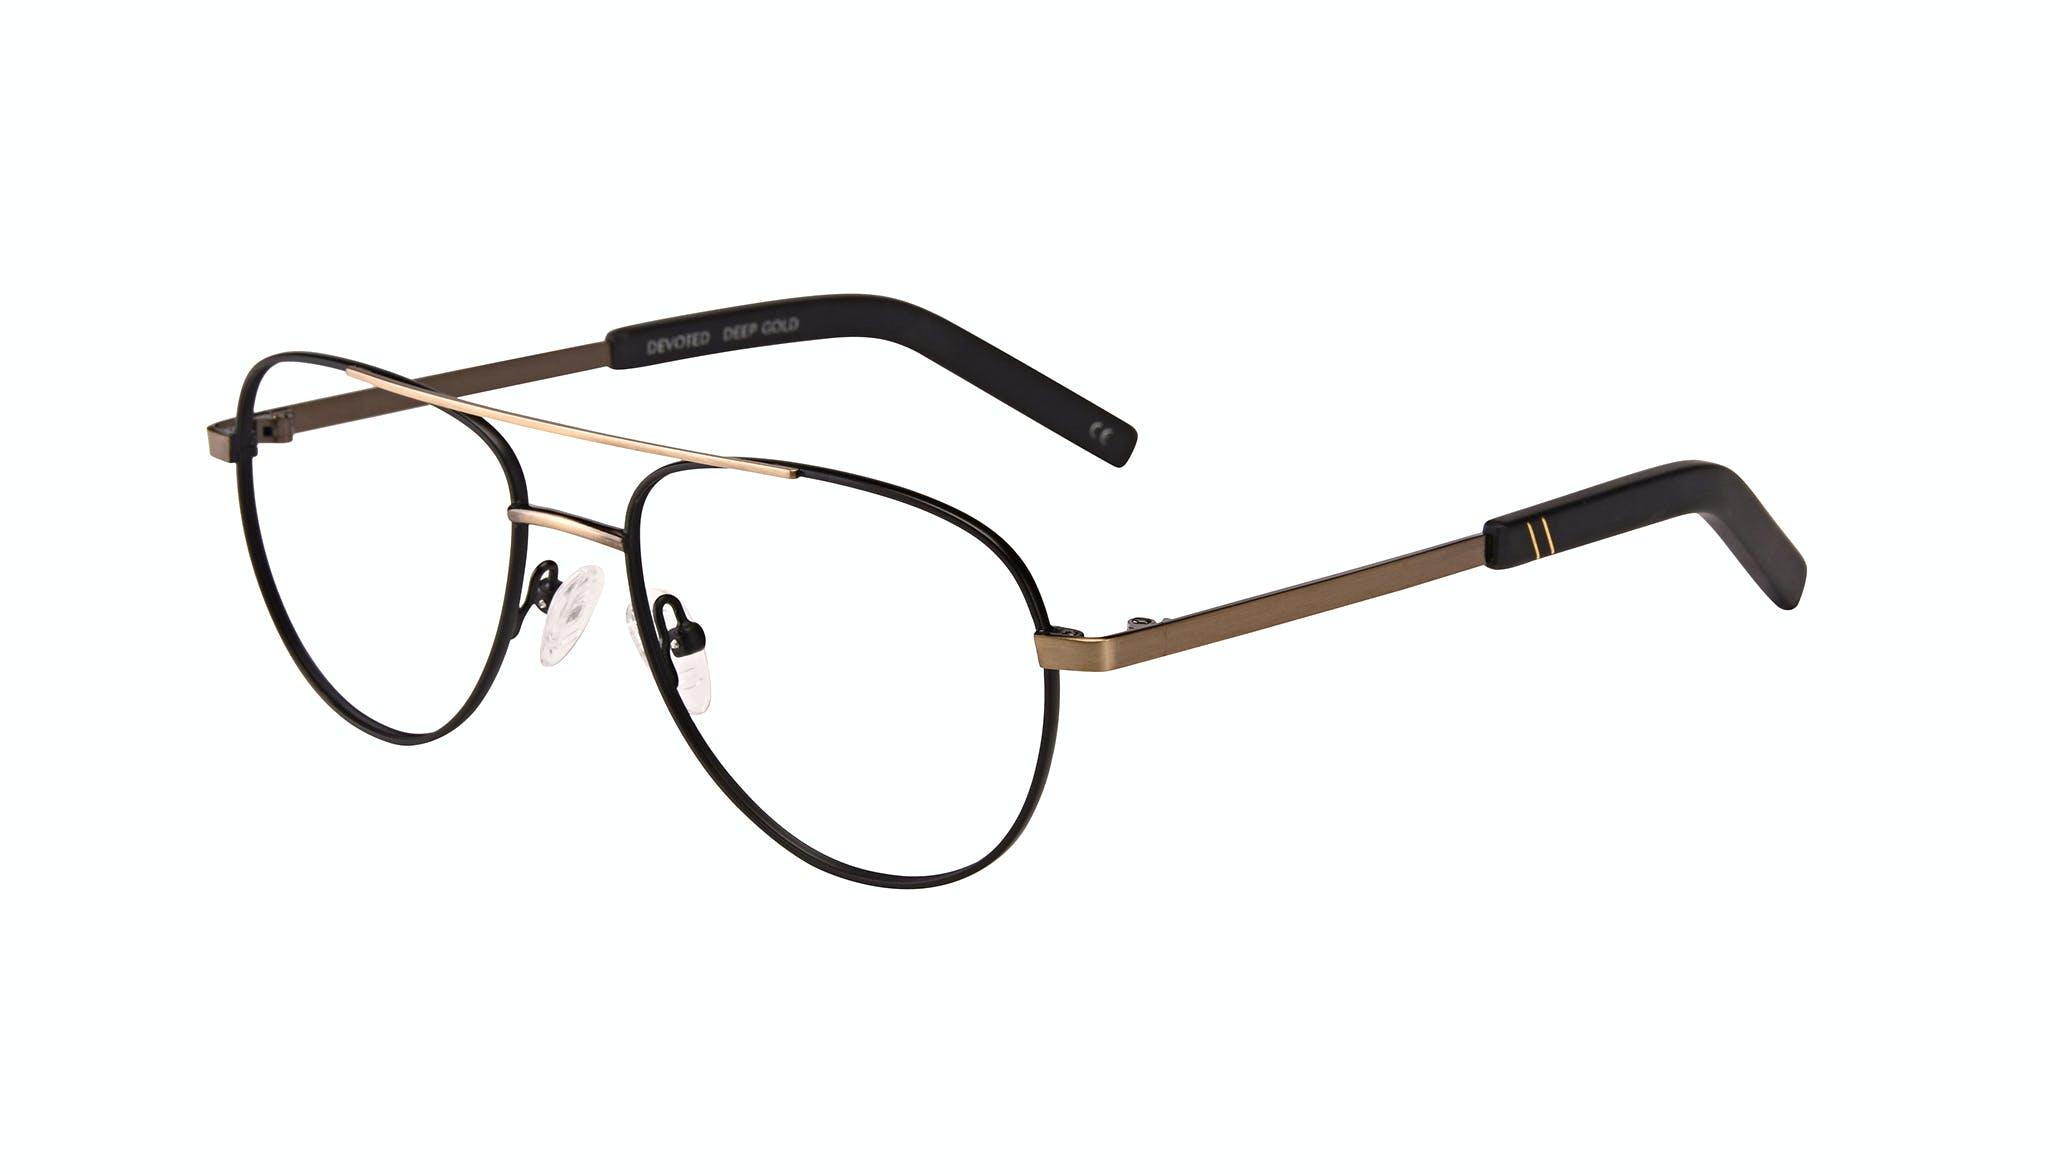 Affordable Fashion Glasses Aviator Eyeglasses Men Devoted Deep Gold Tilt